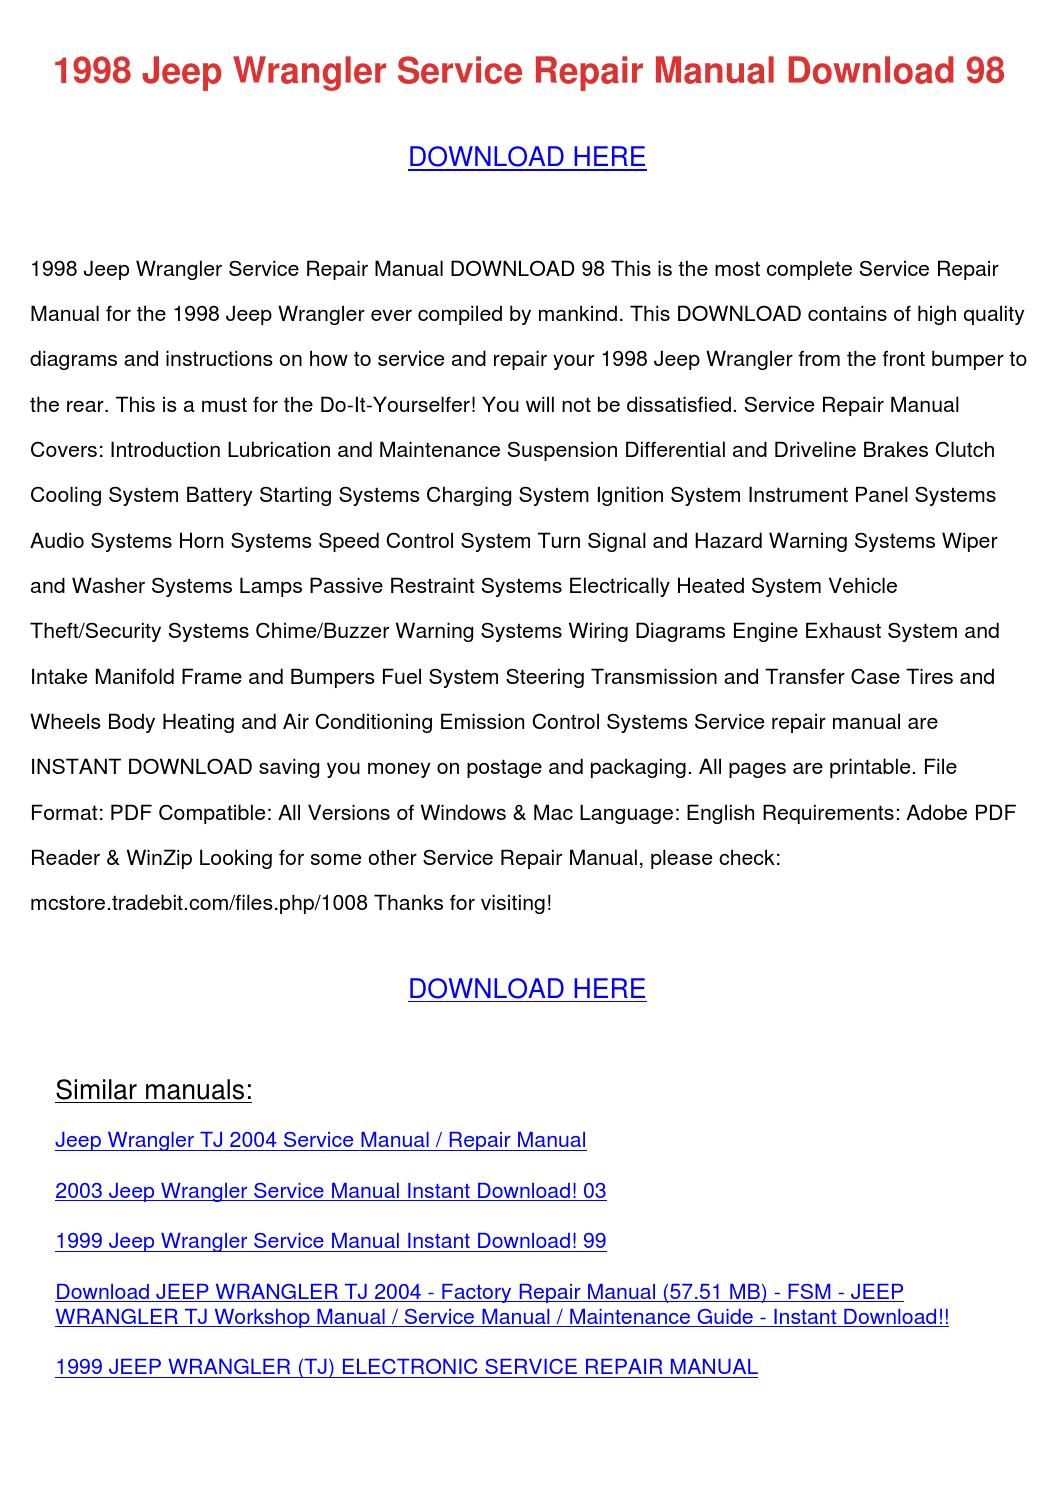 1998 Jeep Wrangler Service Repair Manual Down By Maymcvay